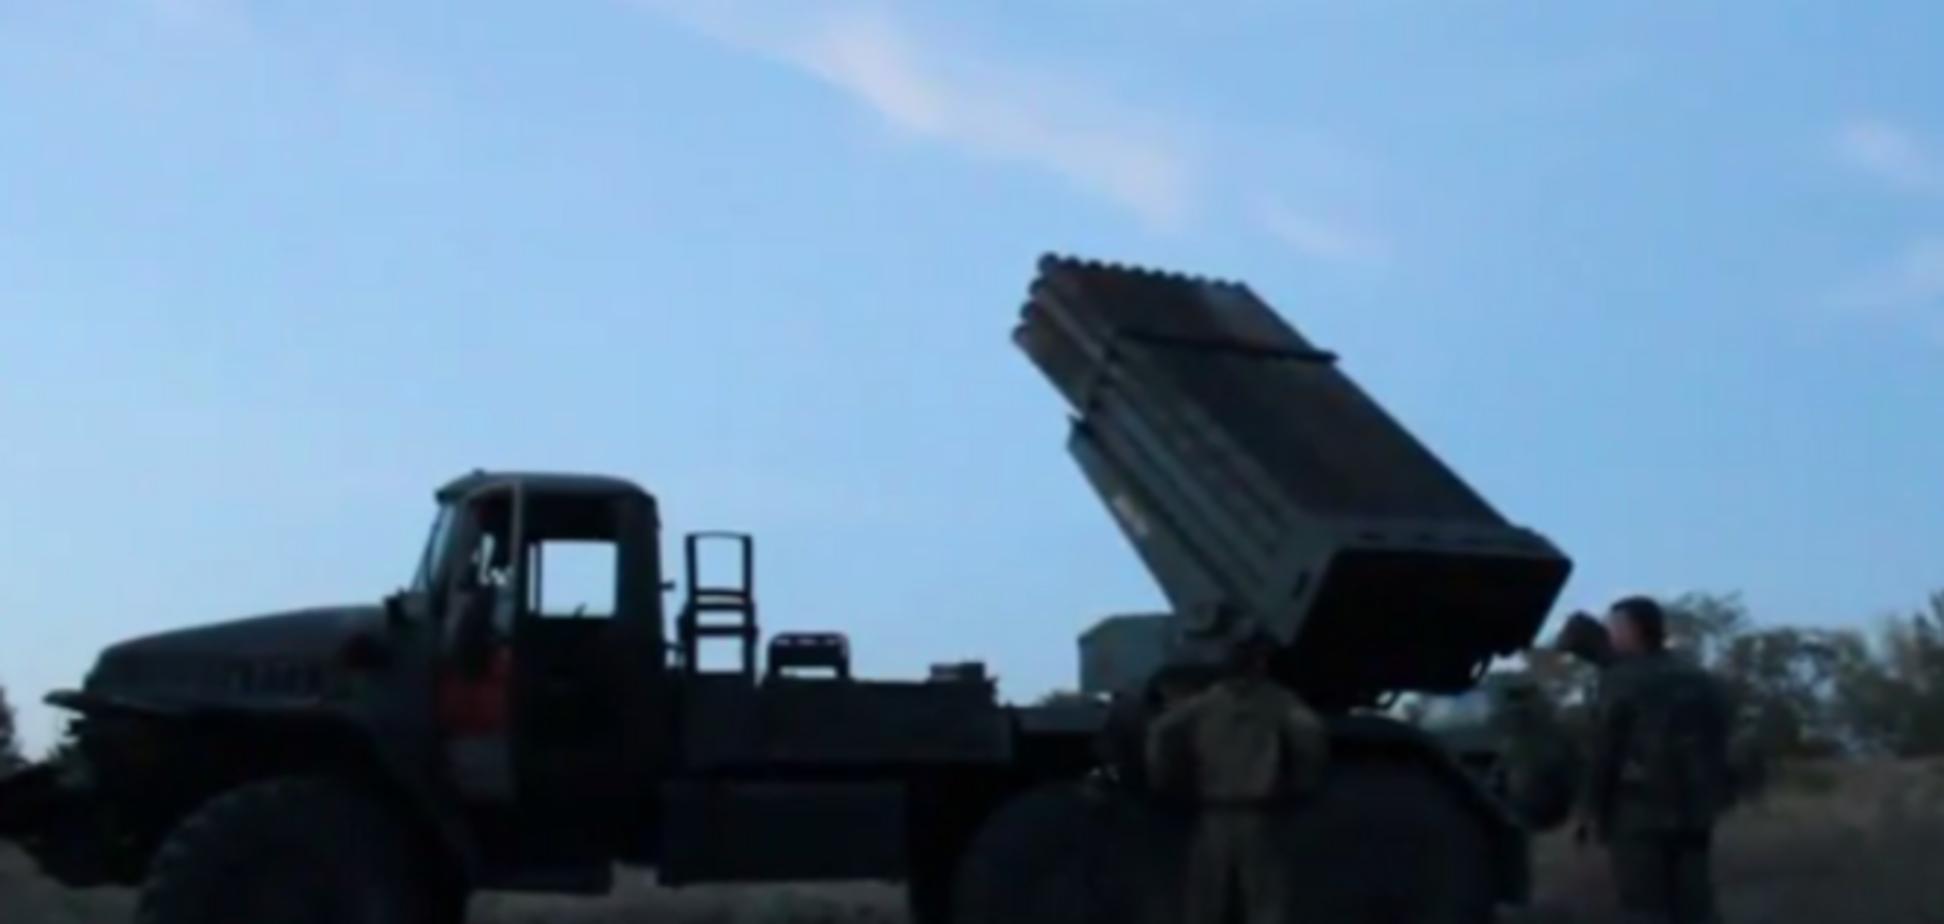 Боевики с хохотом обстреляли 'Градами' позиции сил АТО. Видеофакт